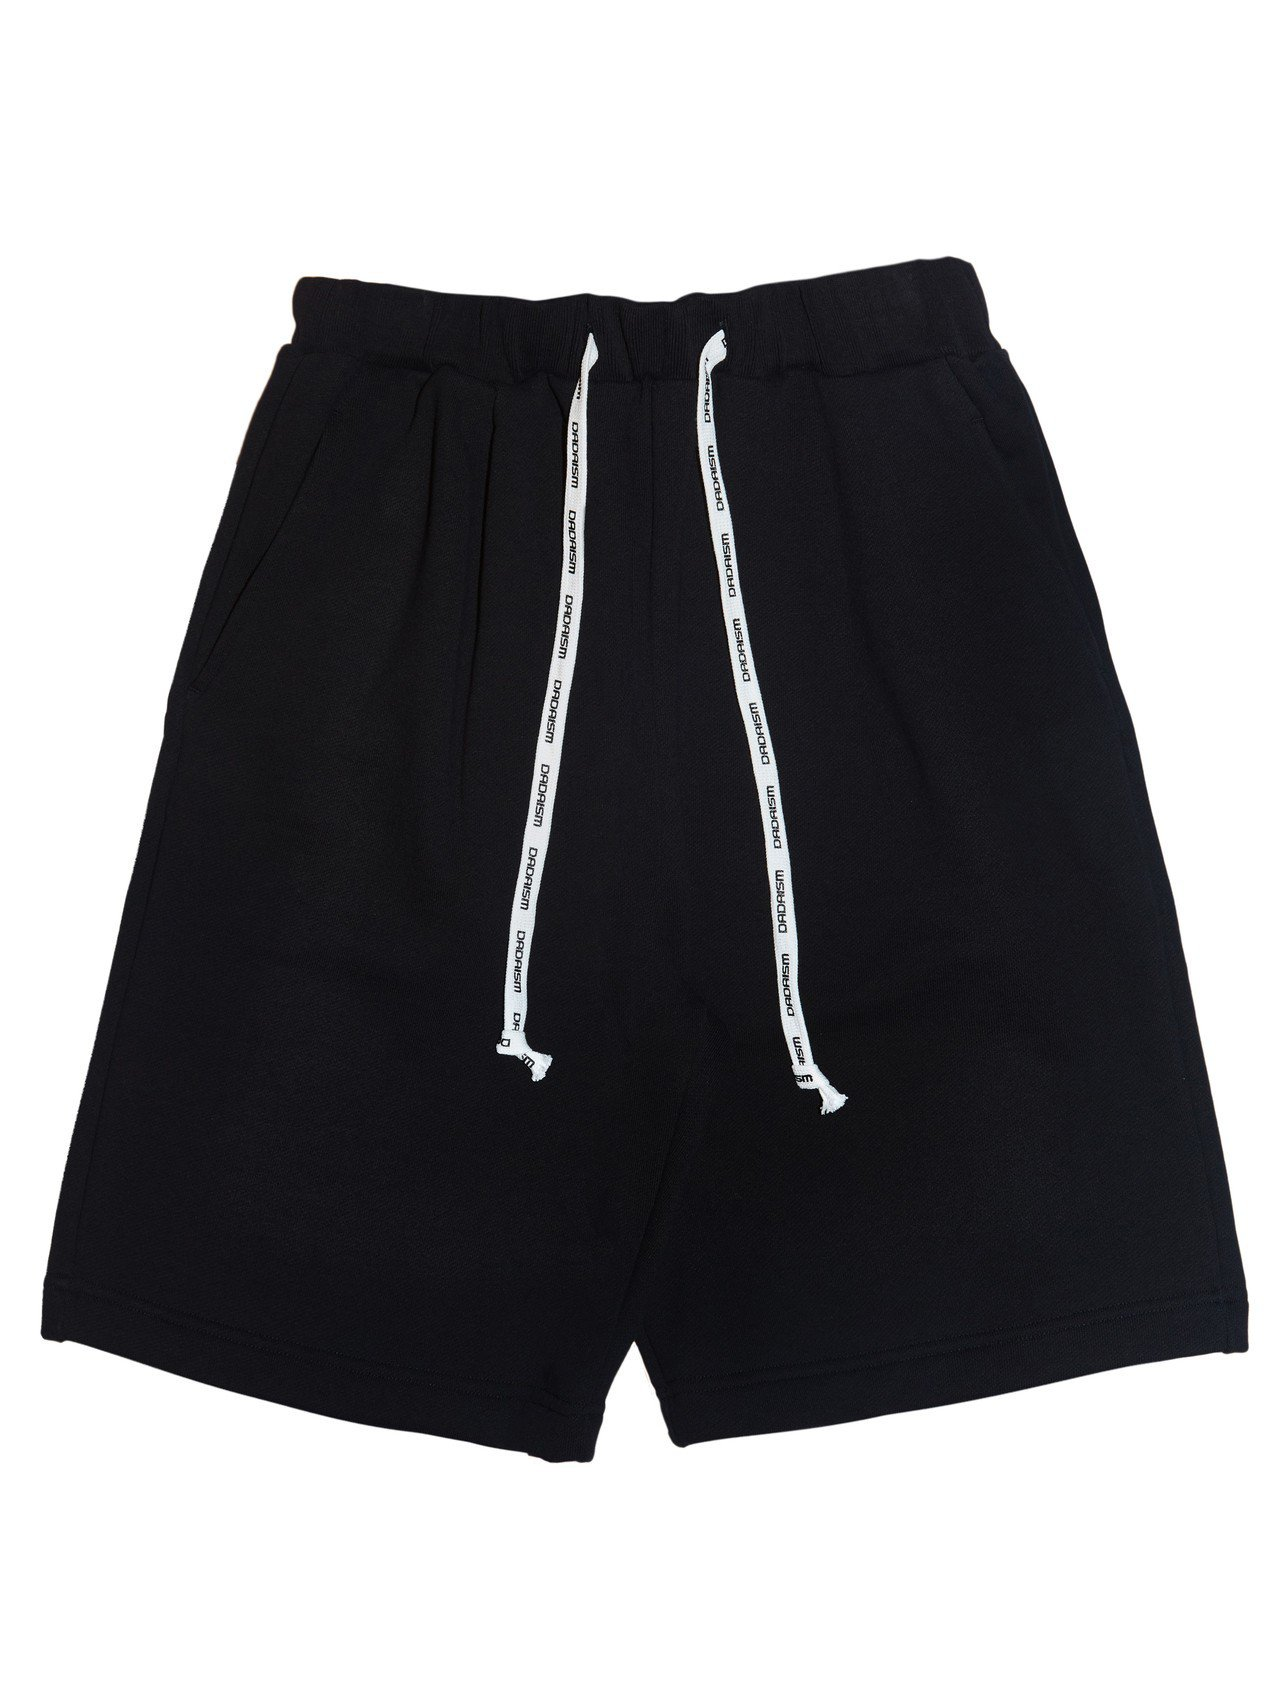 Christian Dada台北限定款黑色短褲,6,900元。圖/Christi...